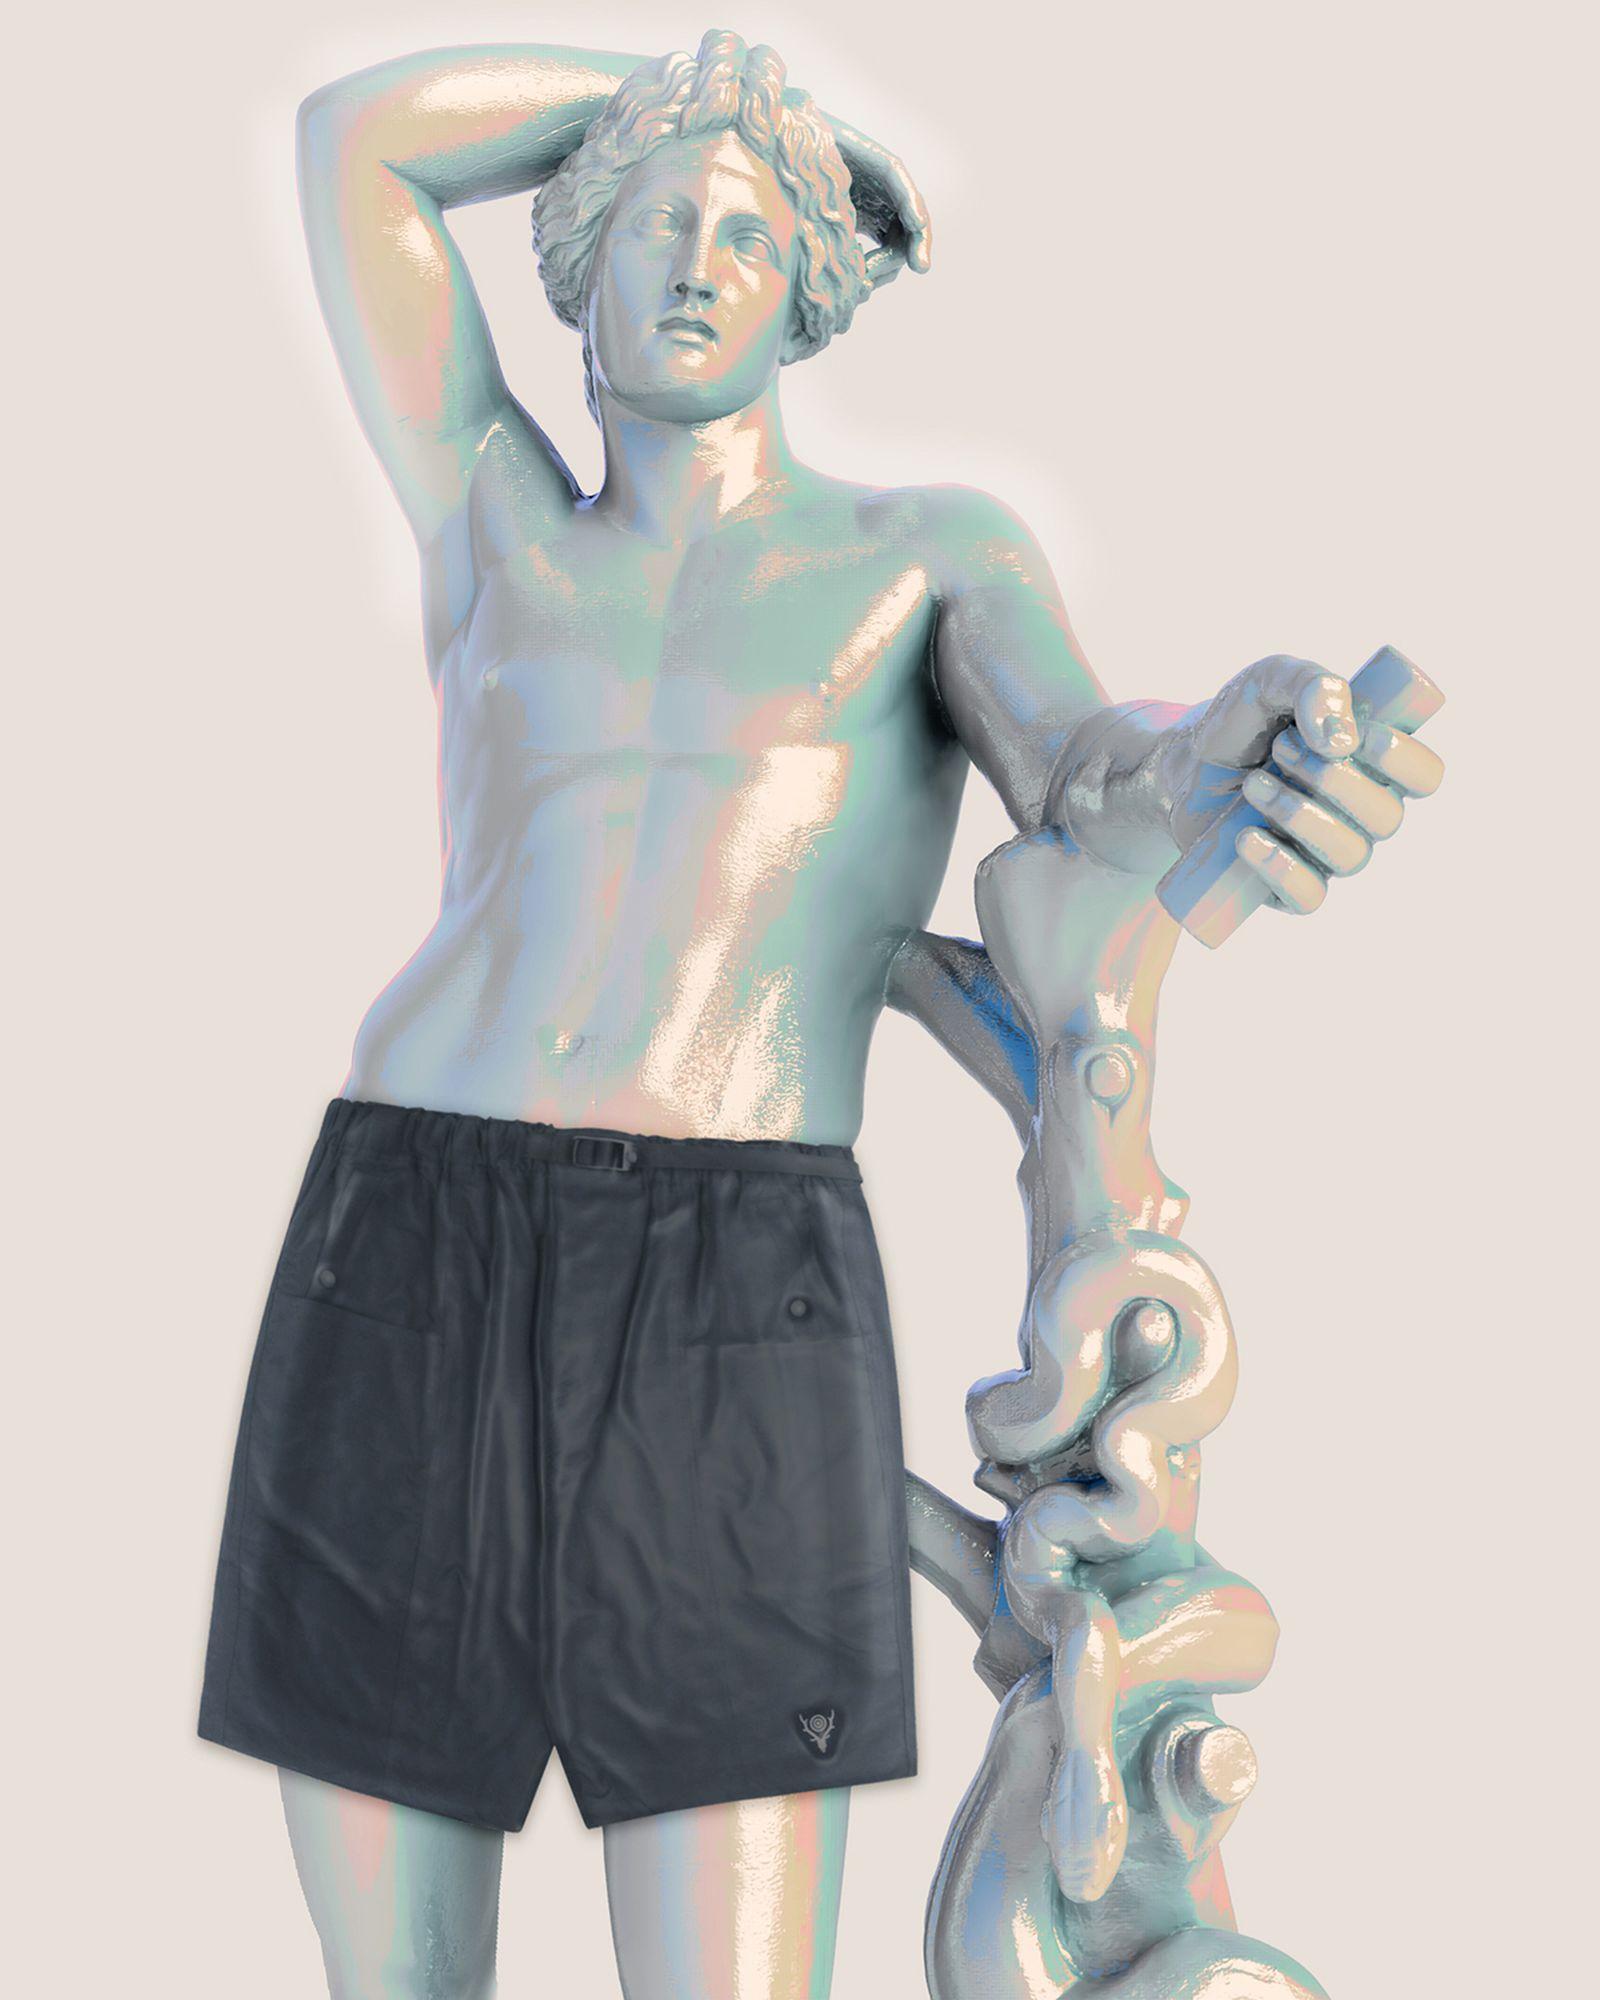 ED_SEL_Summer_Shorts_Hub_HikingShorts_1200x1500